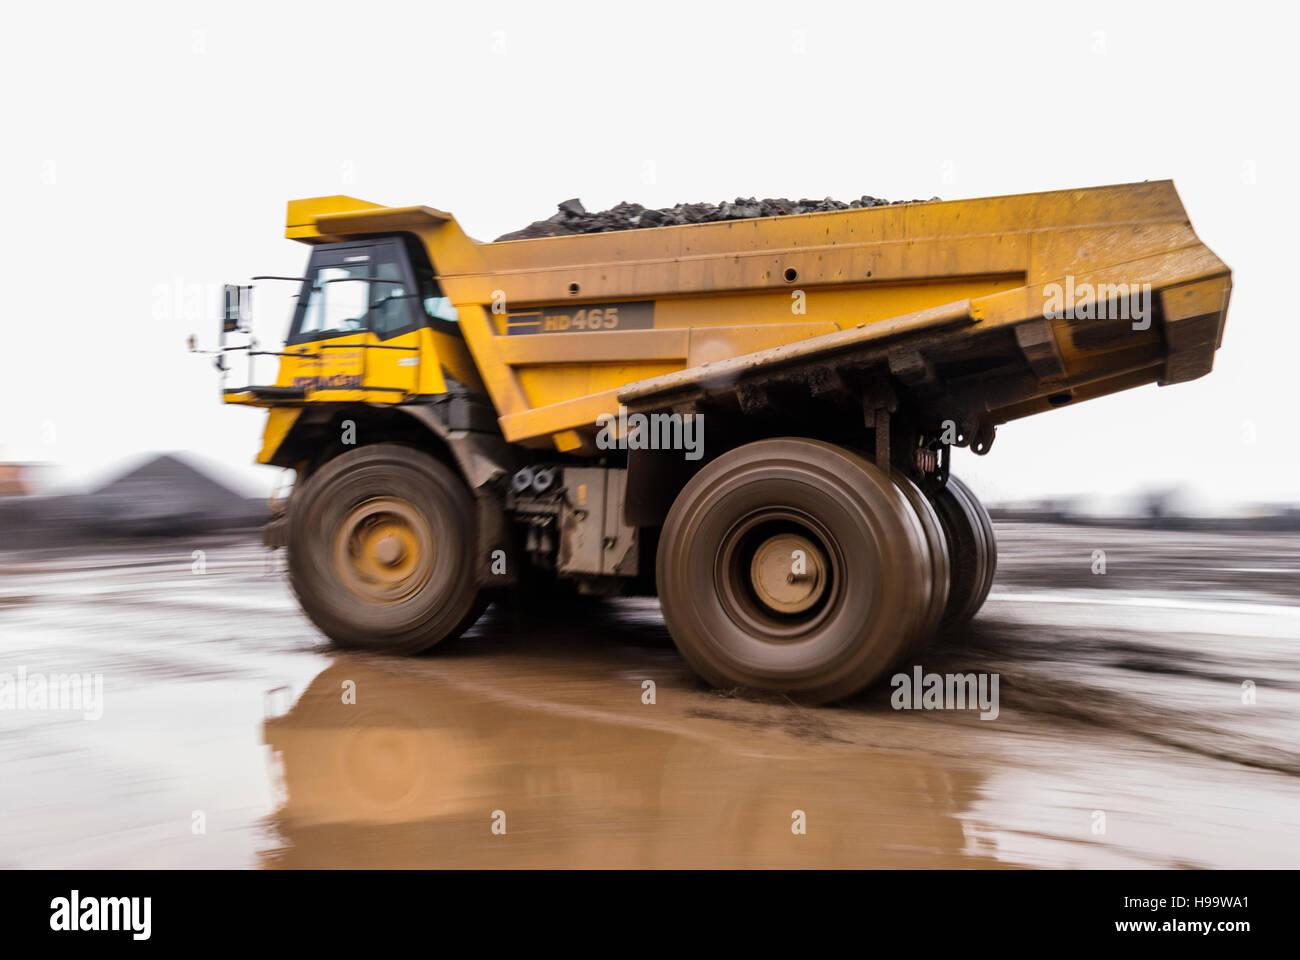 A kubota 465 rock dumper truck takes a full load of stone in a quarry in heavy rain